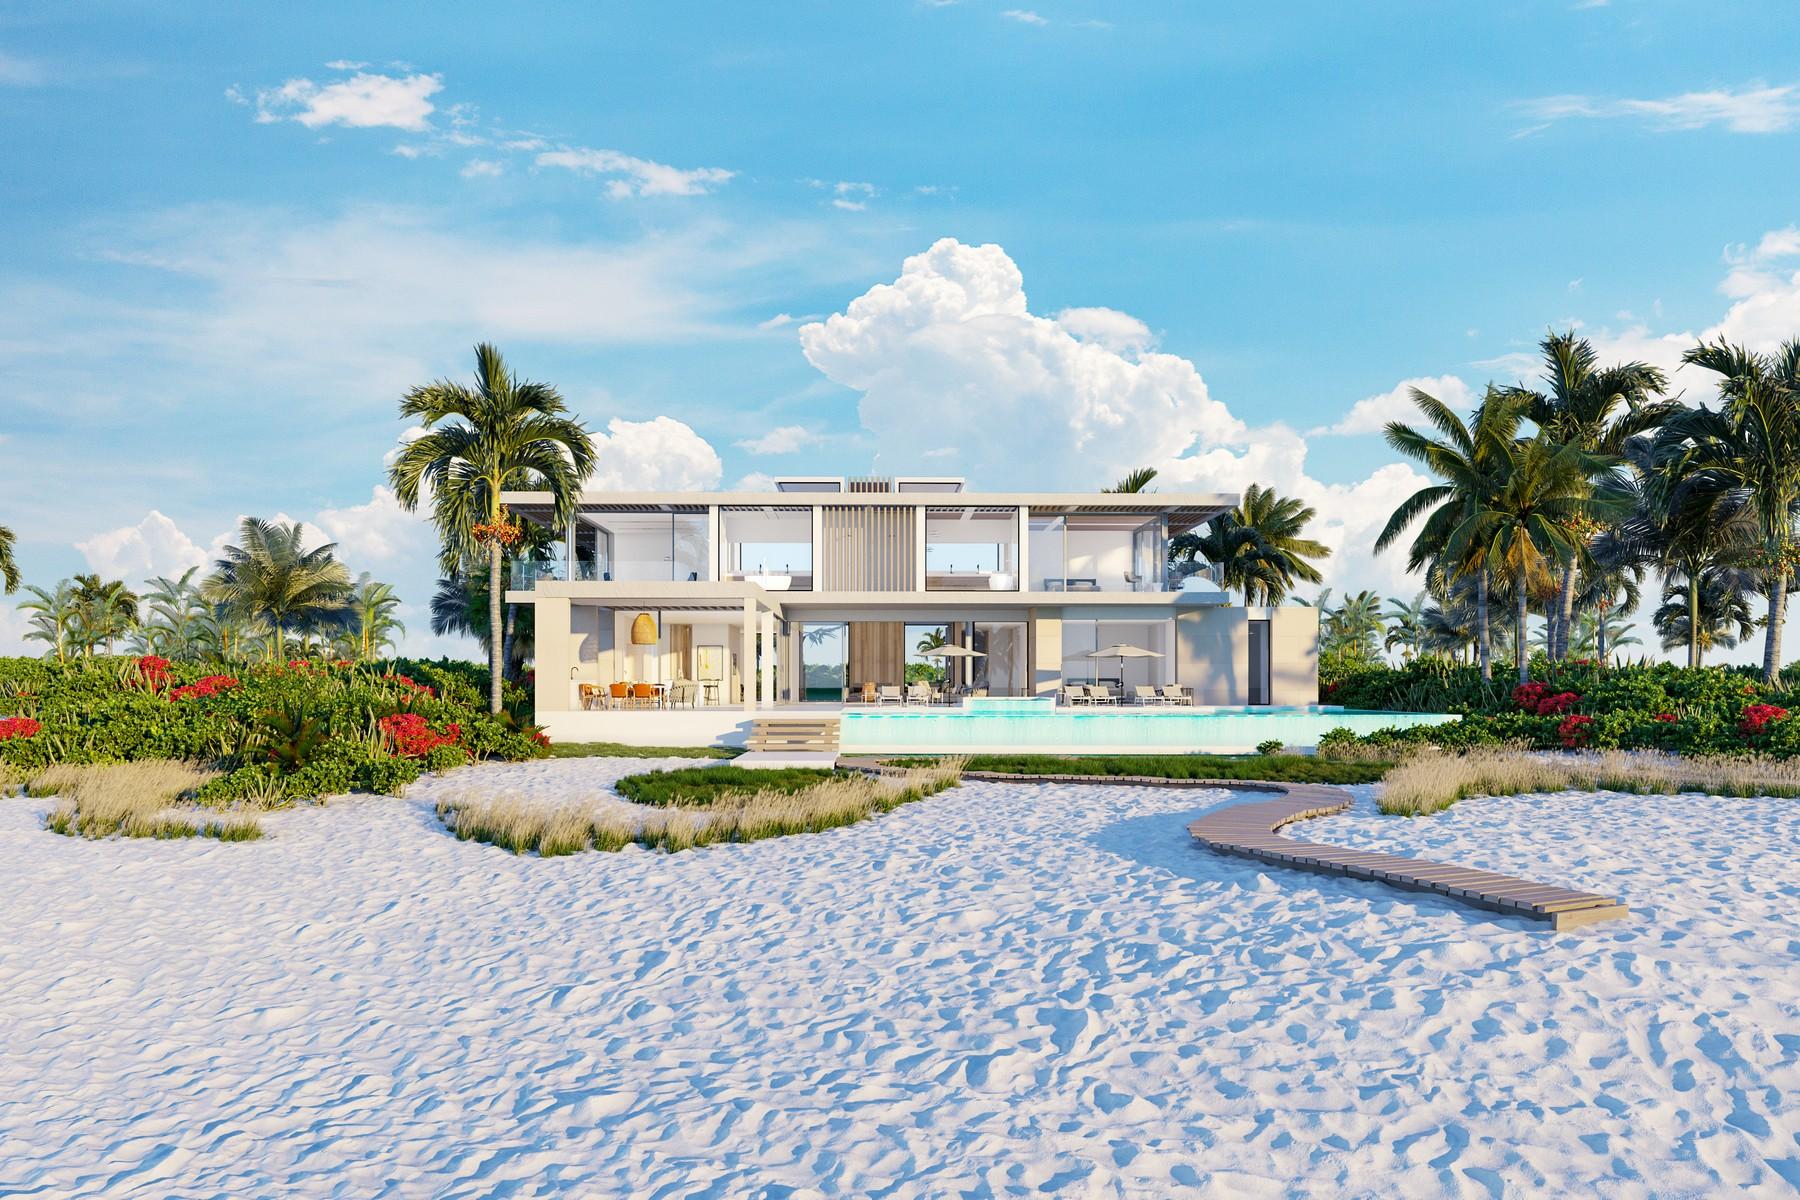 Additional photo for property listing at The Peninsula at Emerald Estate - Beach House 3 Emerald Point Beachfront Leeward, Providenciales TKCA 1ZZ Islas Turcas y Caicos